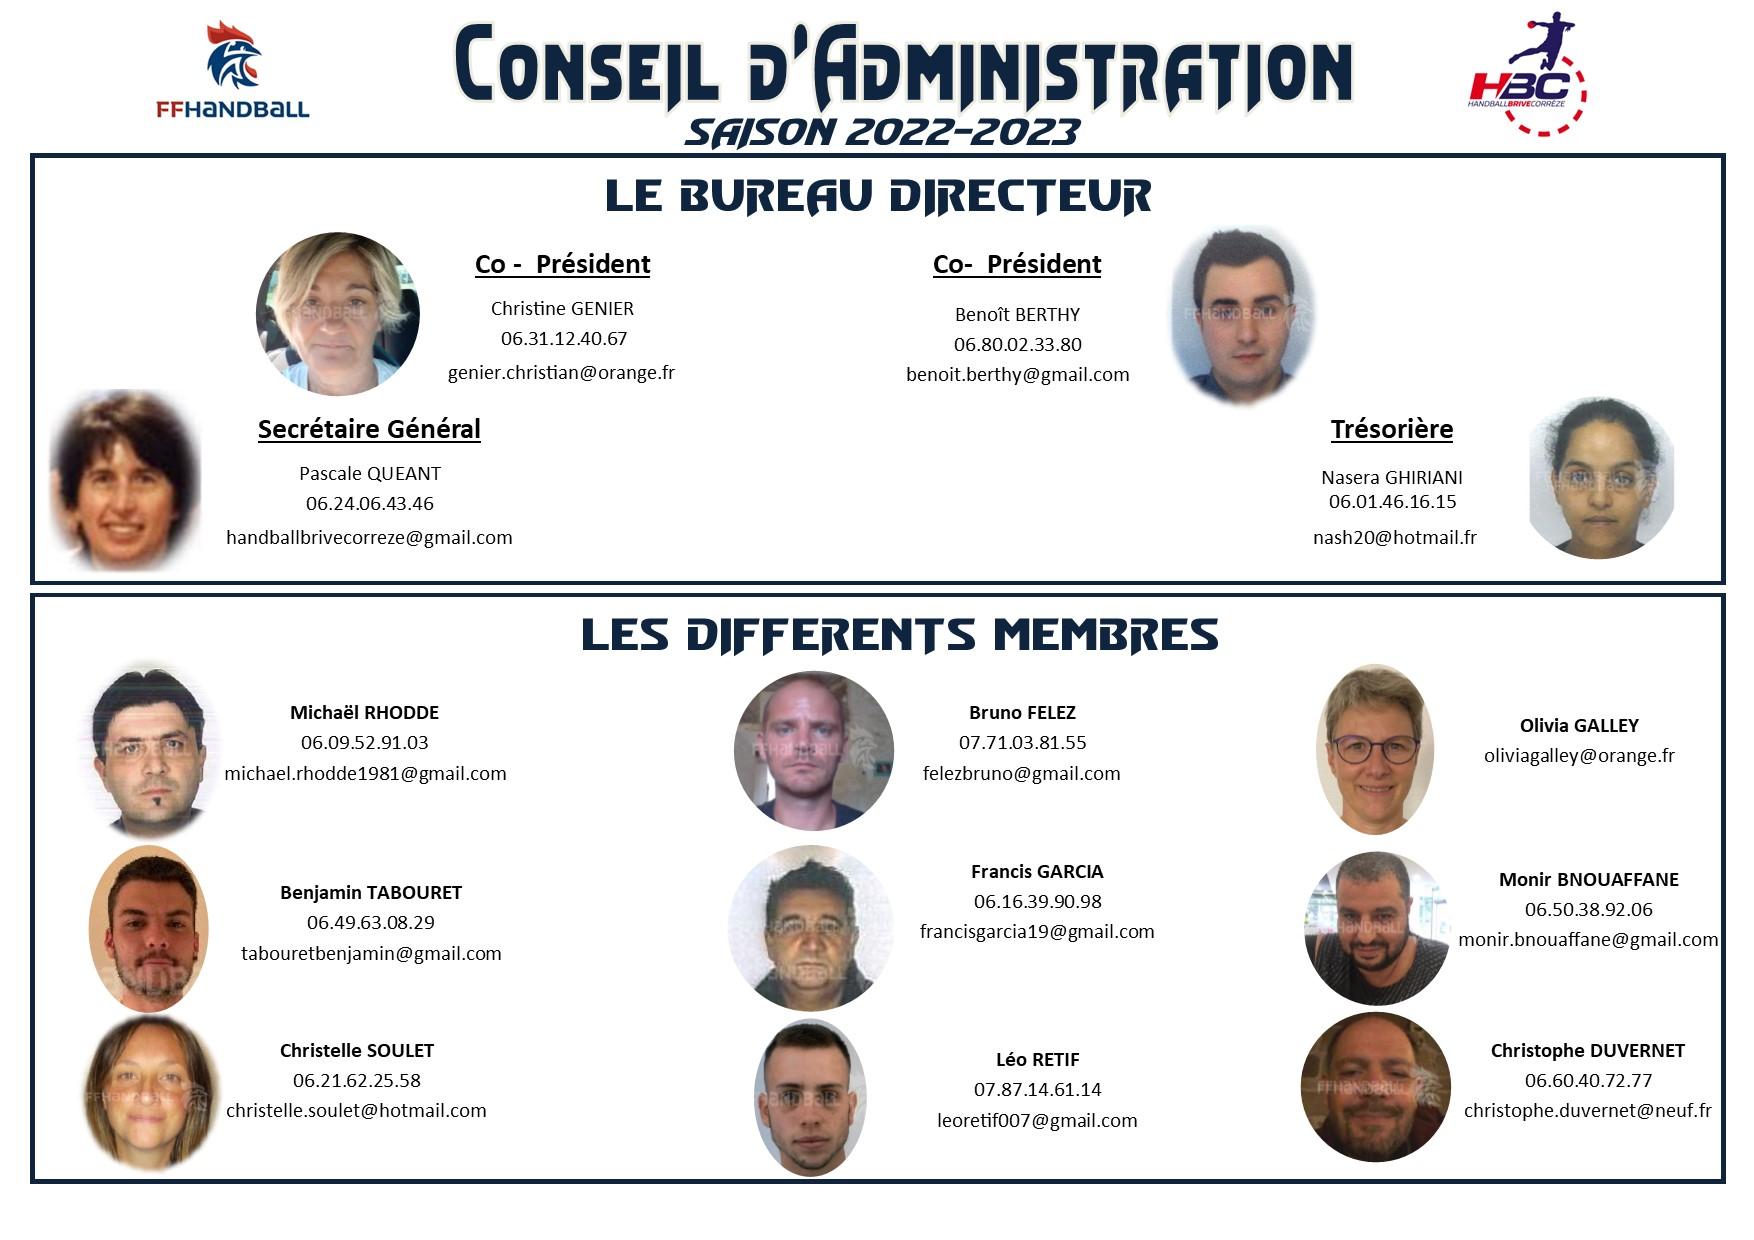 Conseil d'administration